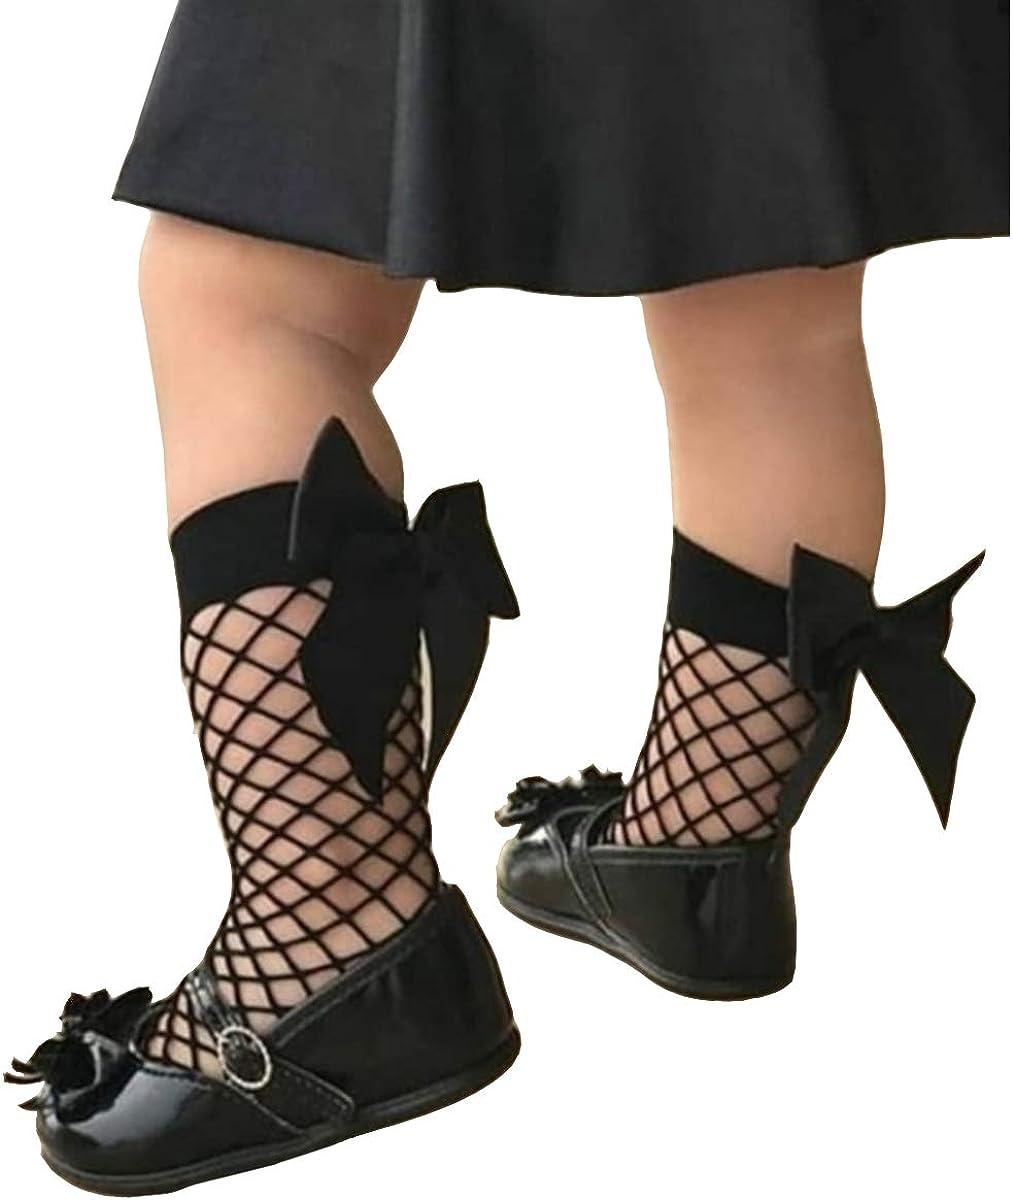 Toddler Kids Girls Fishnet Stockings Mesh Fancy Sock Glitter Tights Sparkle Legging Fashion Outfits